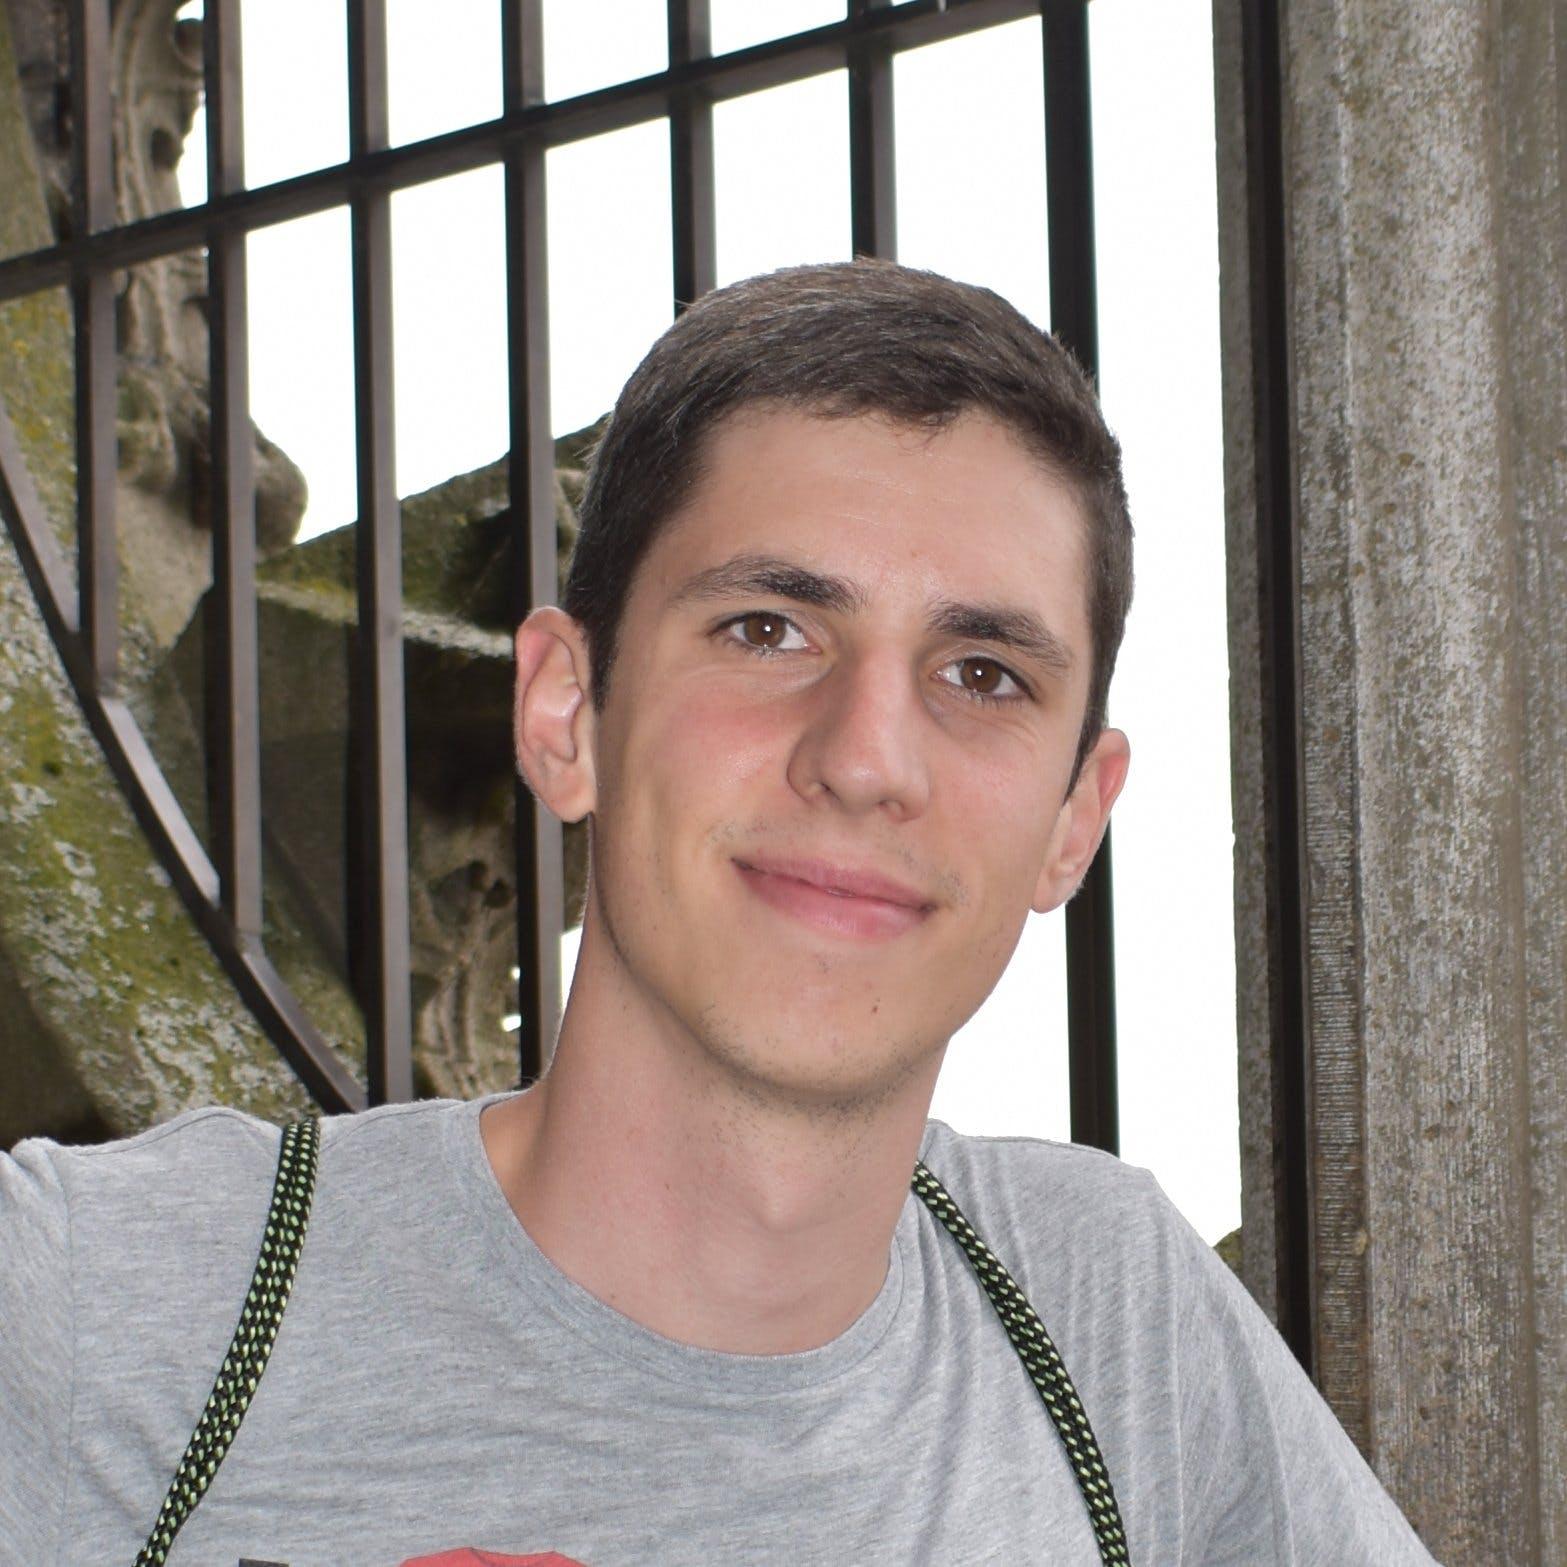 Luis Roda Sánchez